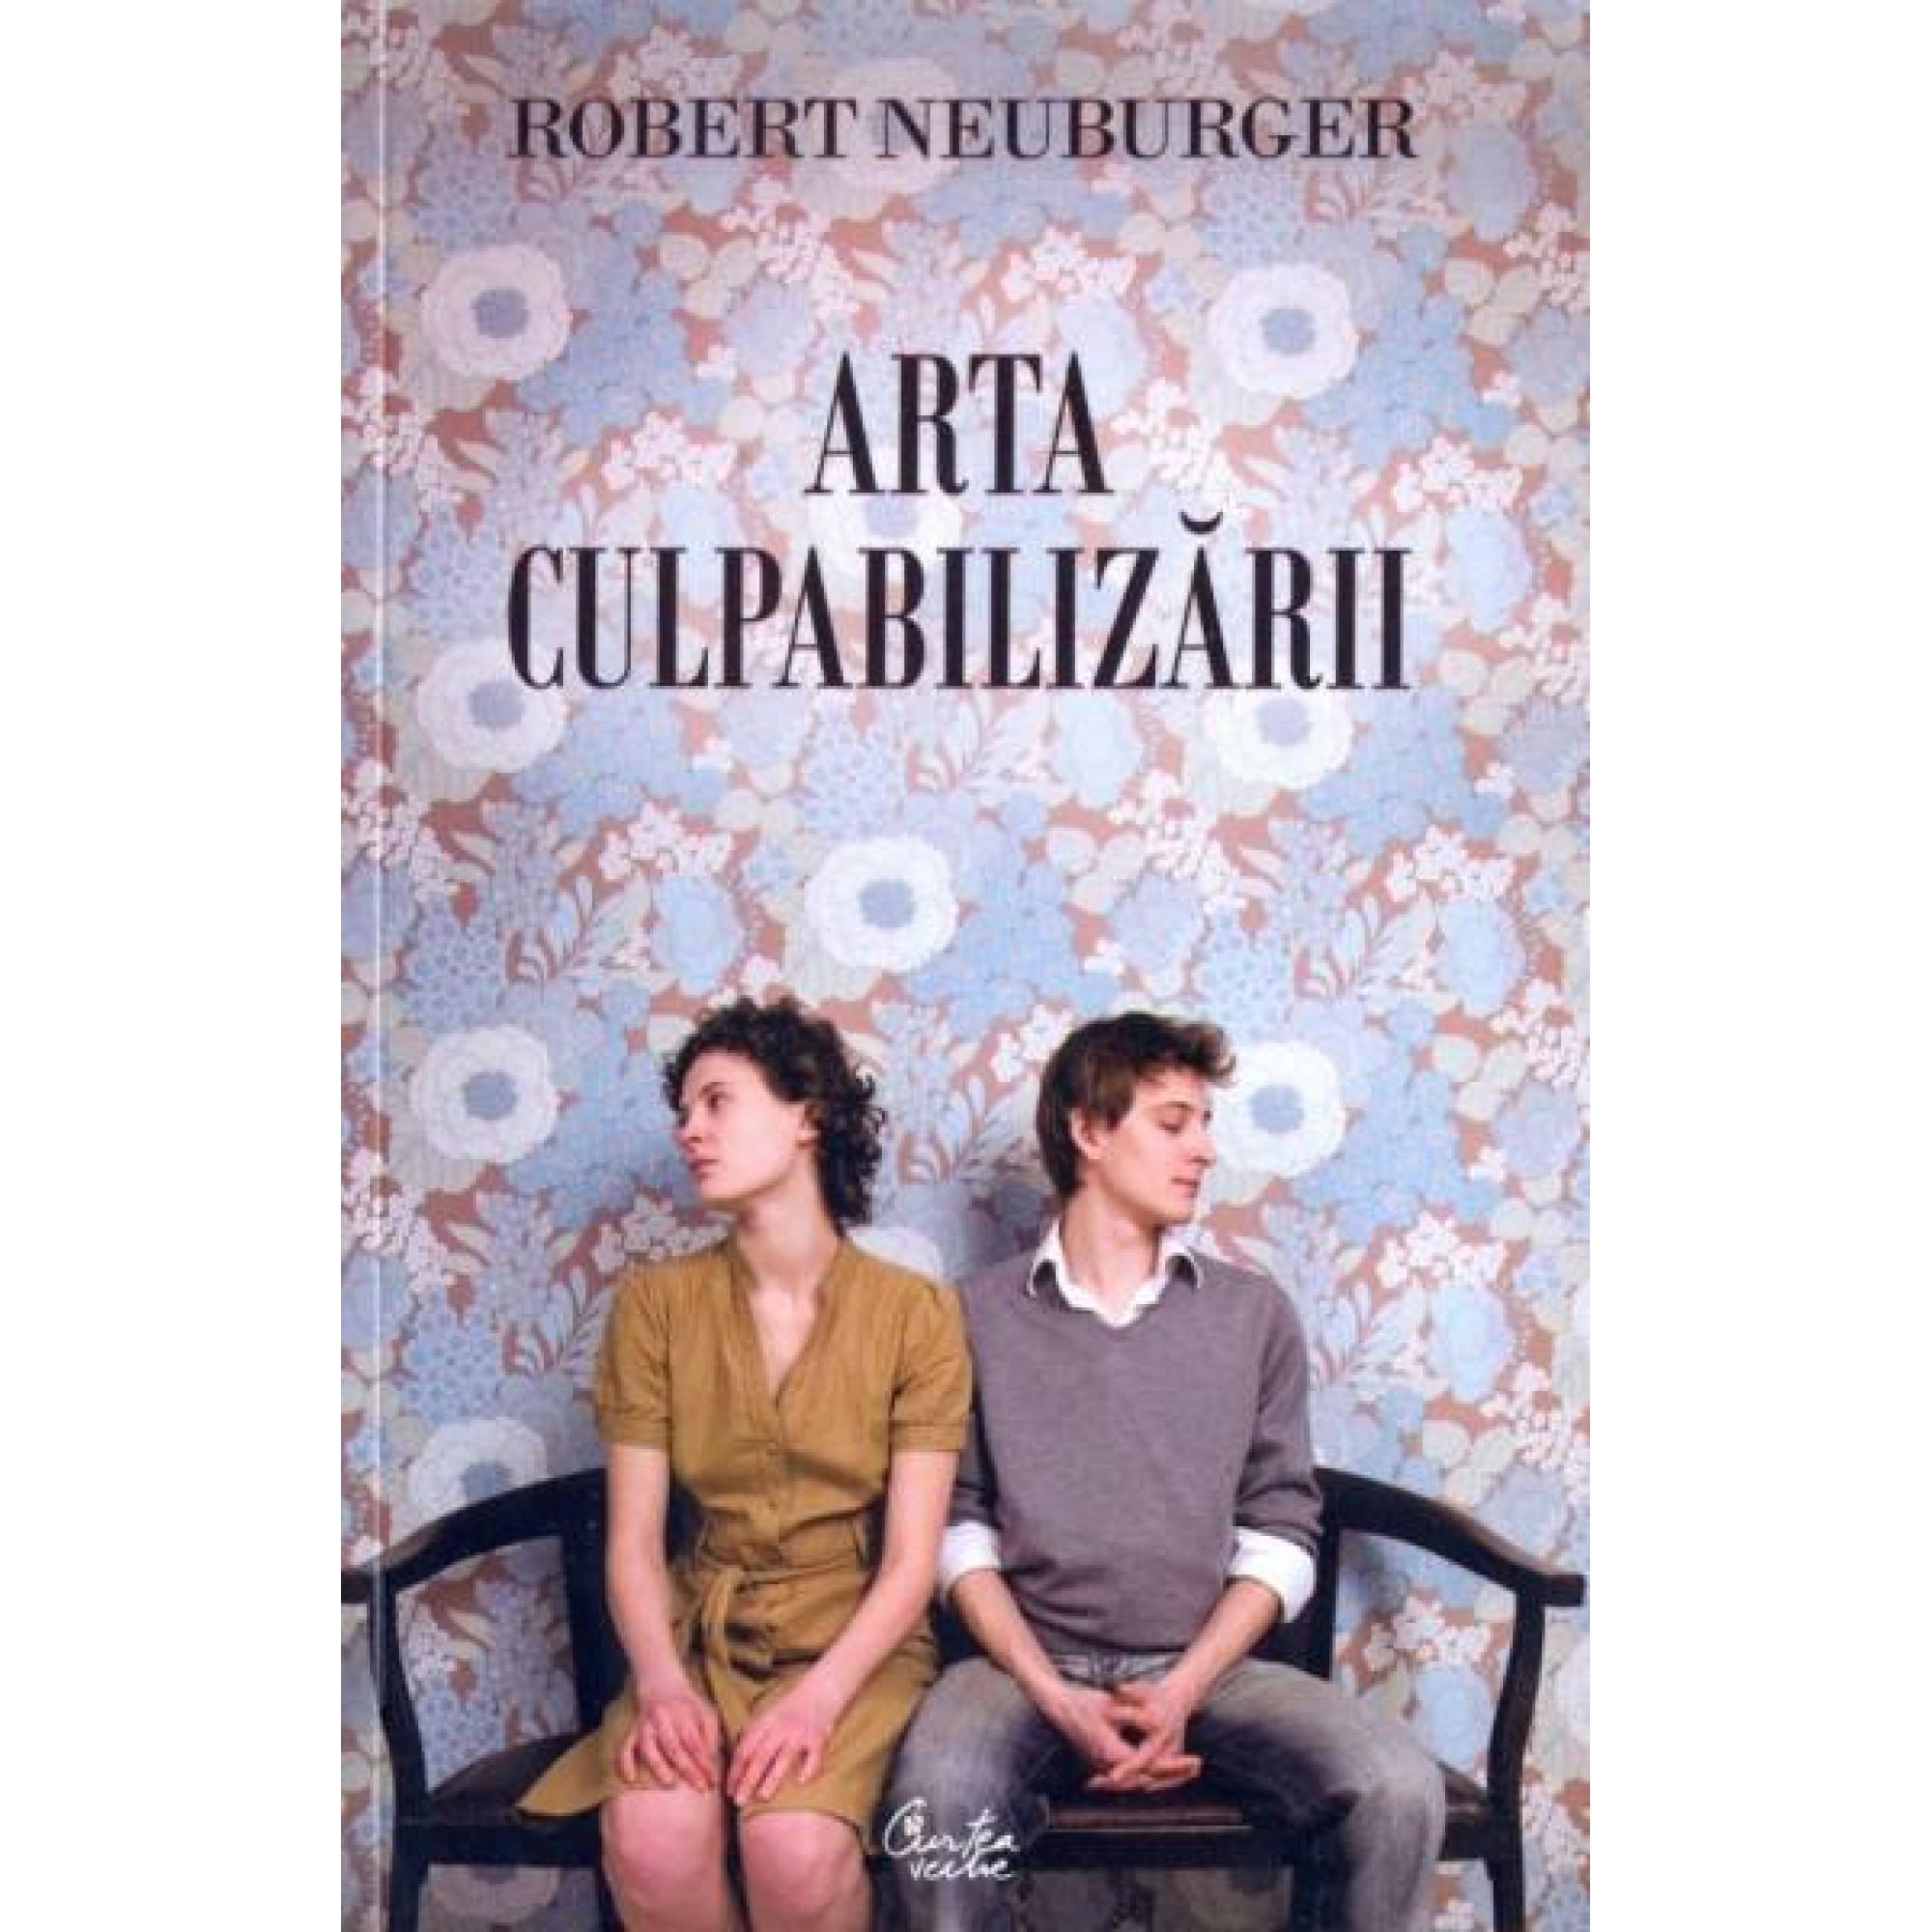 Arta culpabilizării; Robert Neuburger